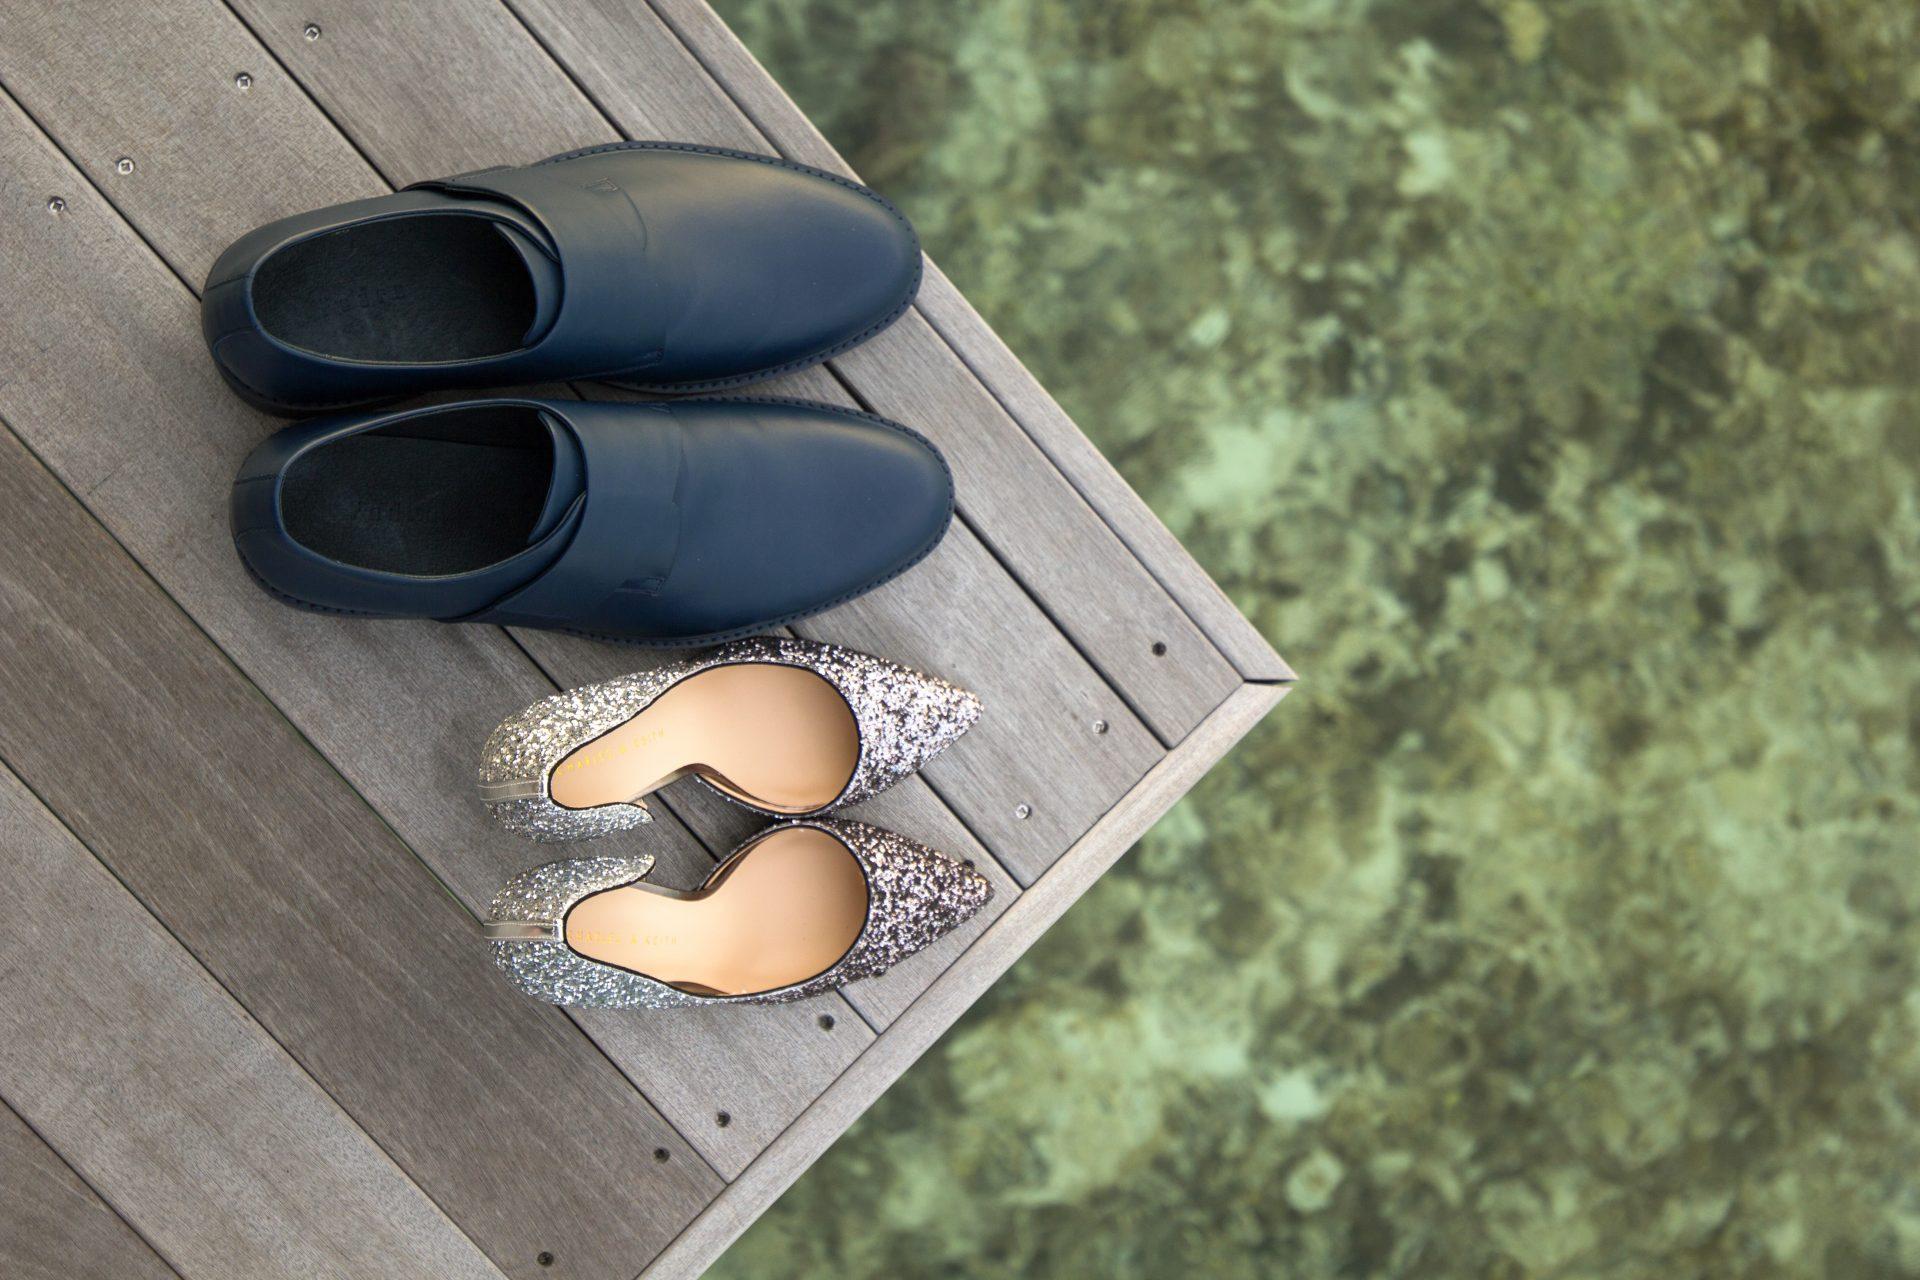 kako-su-napravljene-prve-cipele-nastanak-primitivnih-oblika-obuce-kako-hr